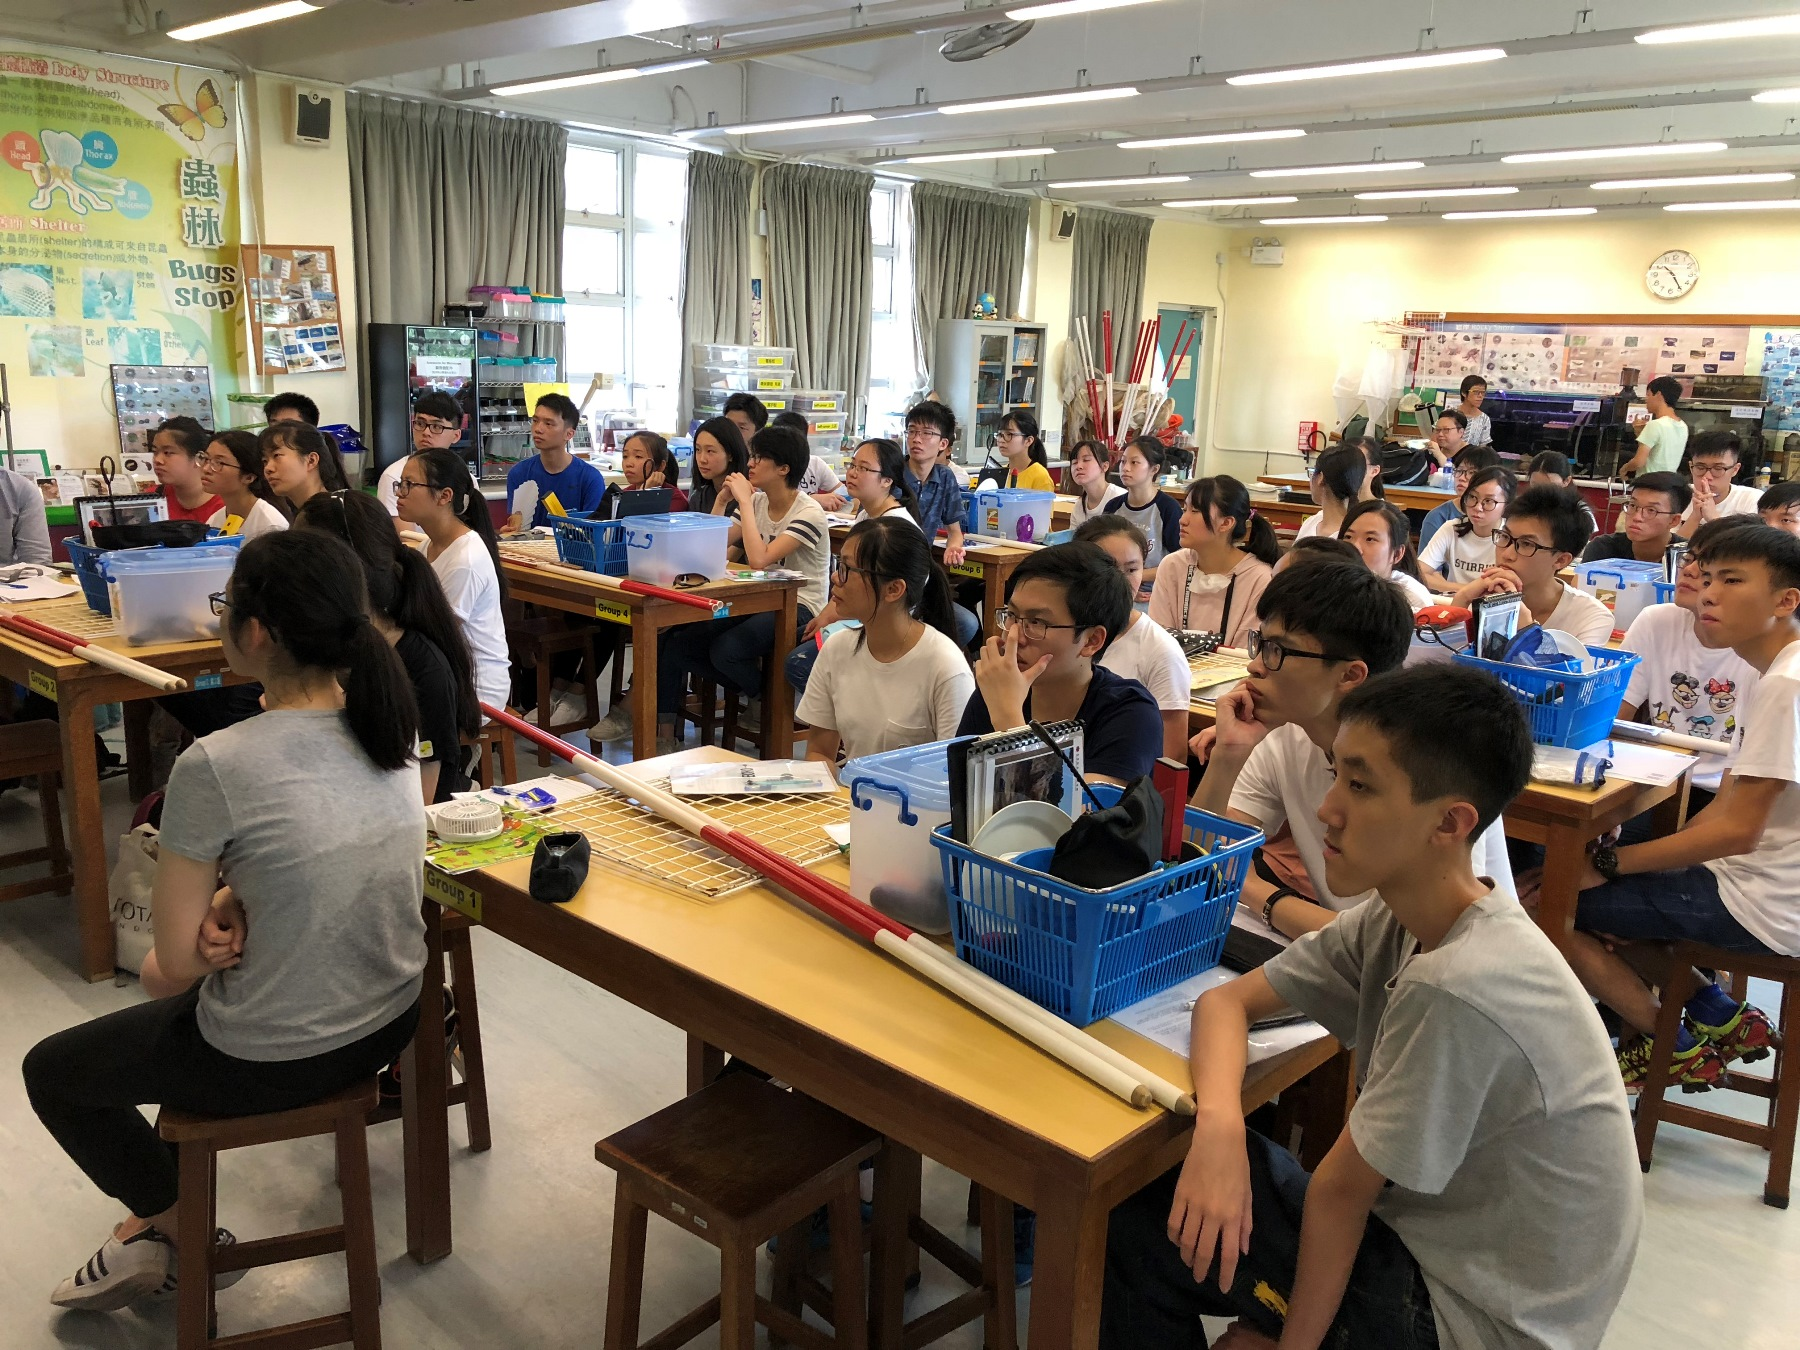 http://npc.edu.hk/sites/default/files/2_1337.jpg